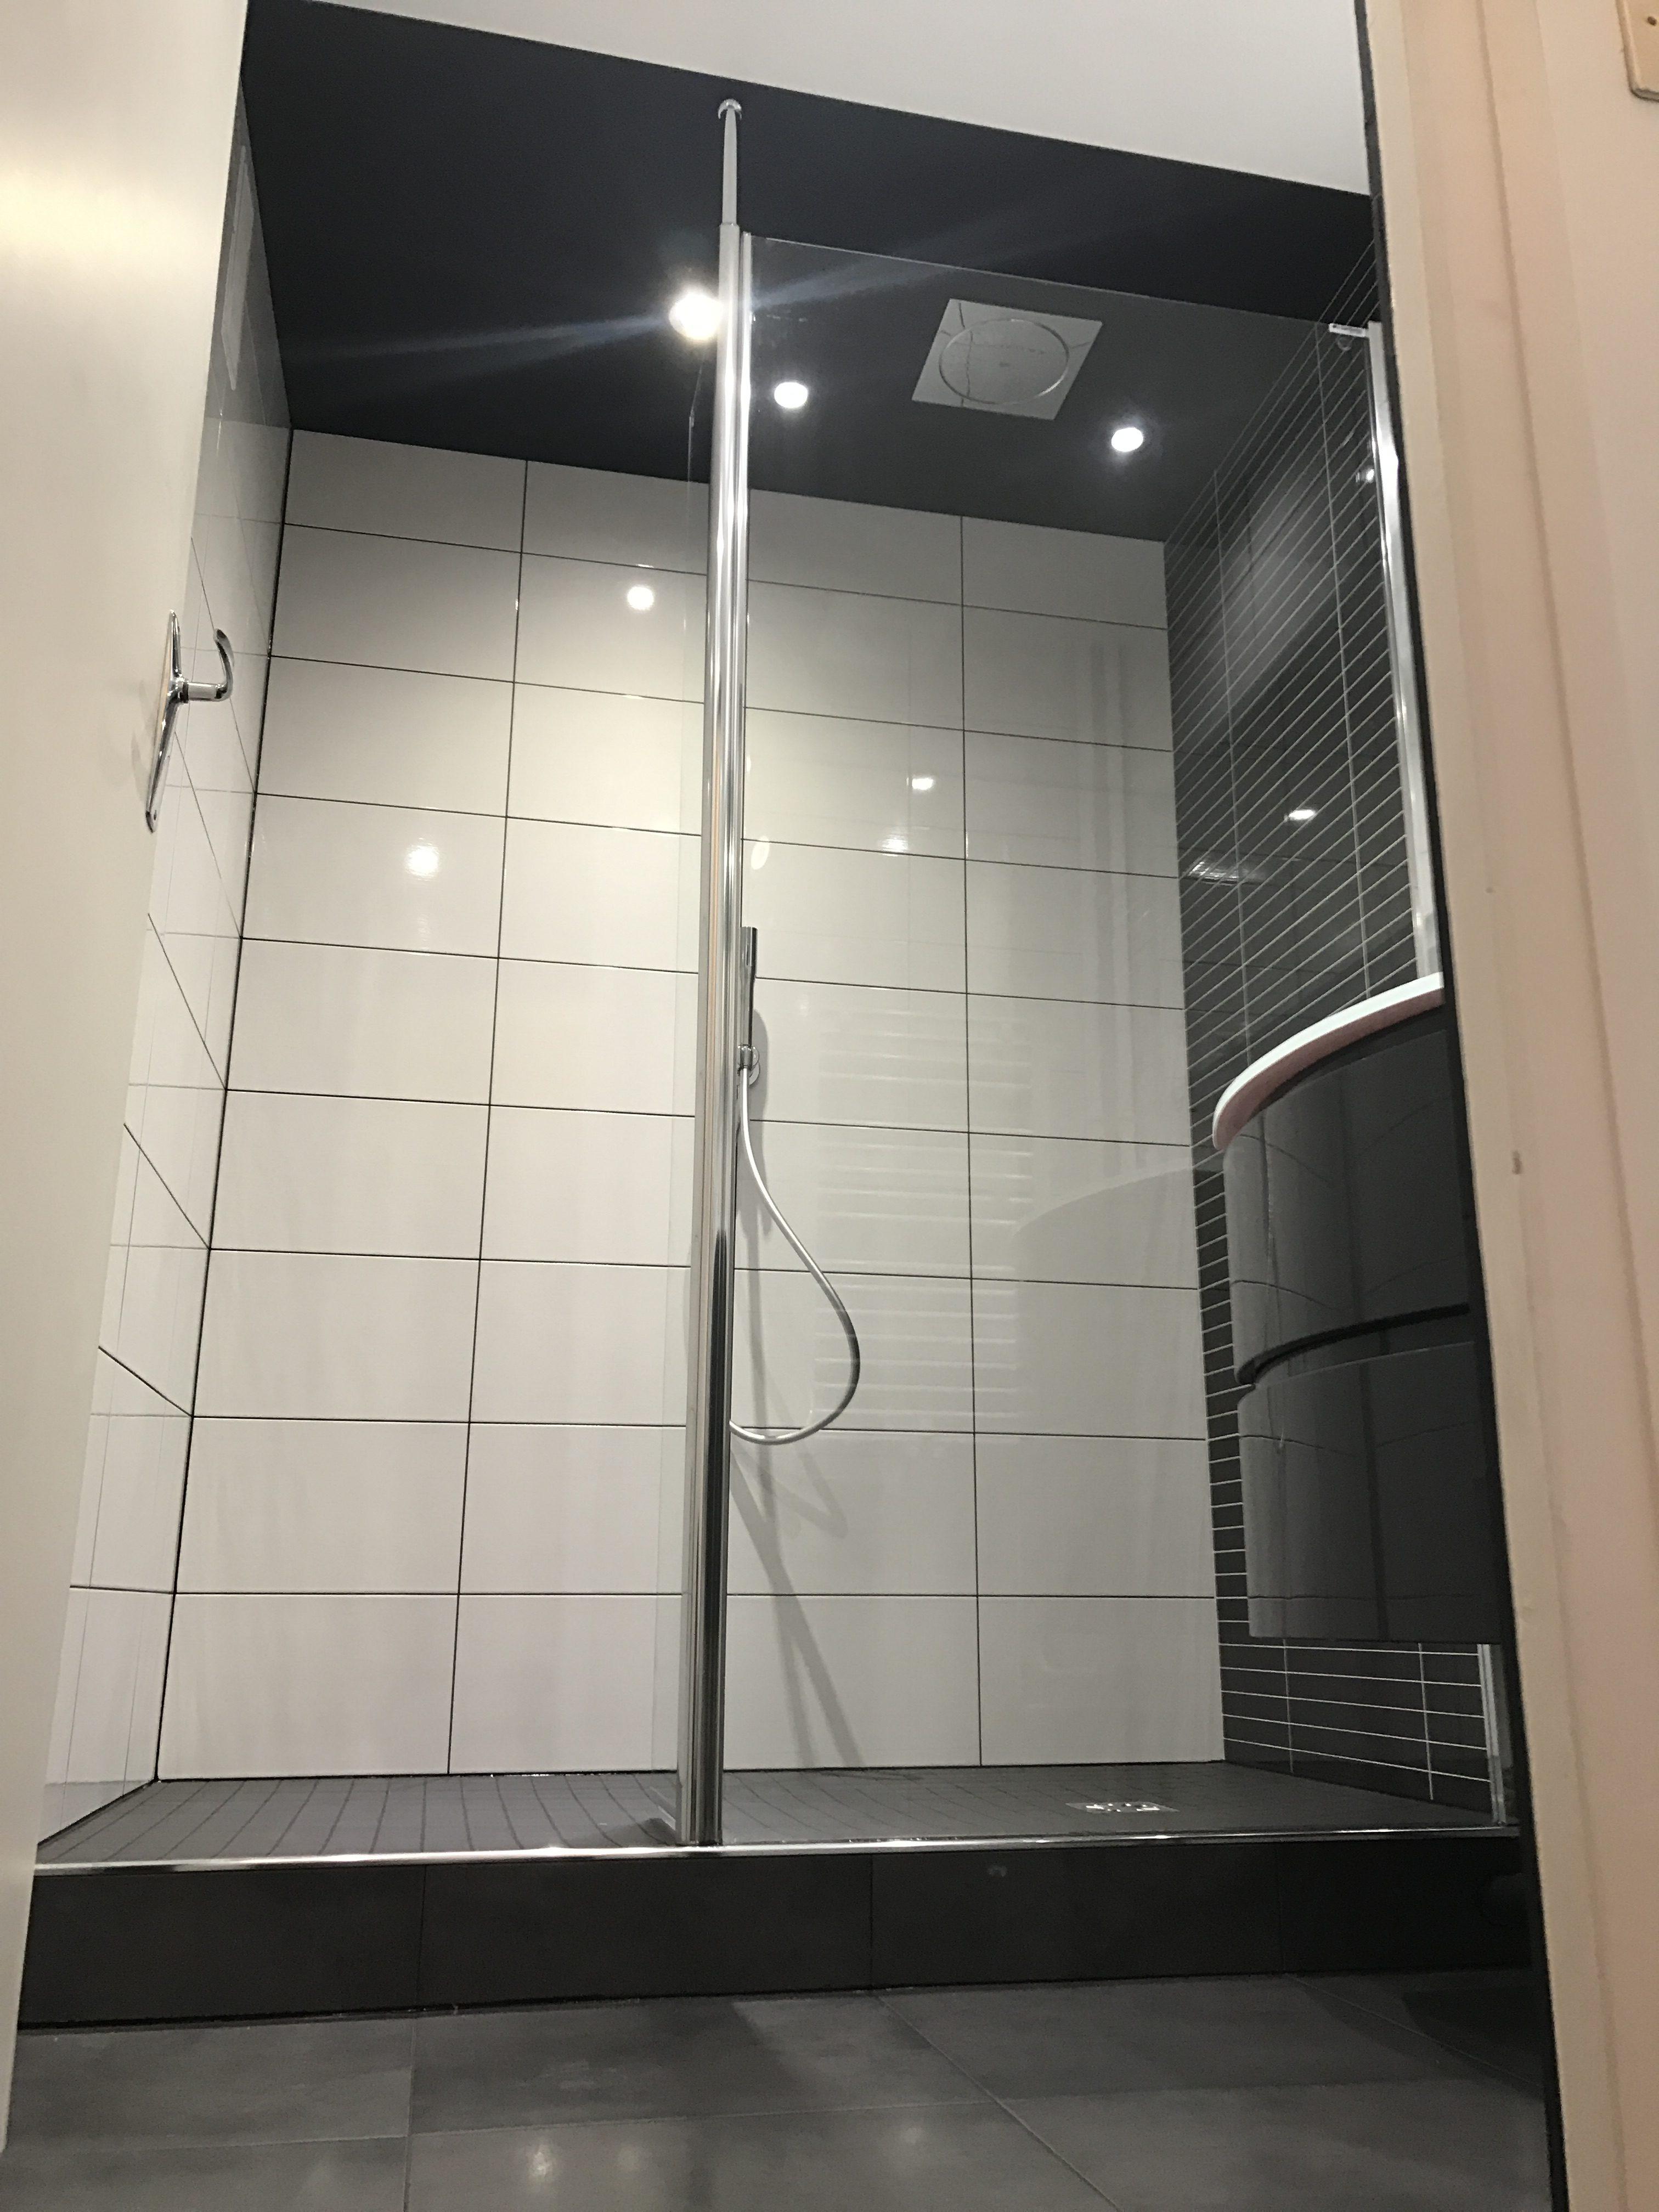 realisation-salle-de-bain-lcrdp-renovation-orleans-9